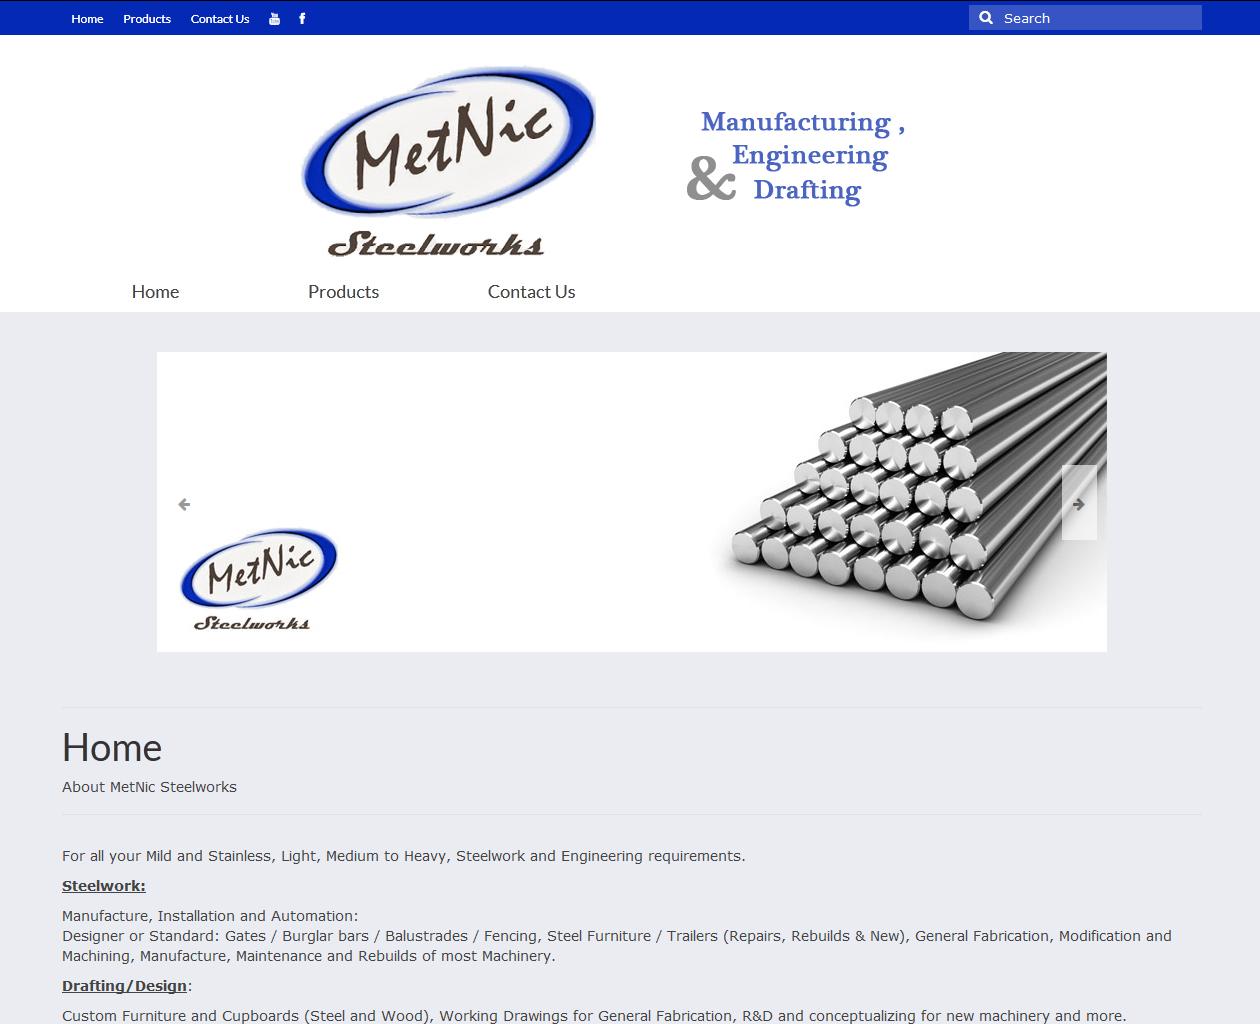 Metnic Steelworks